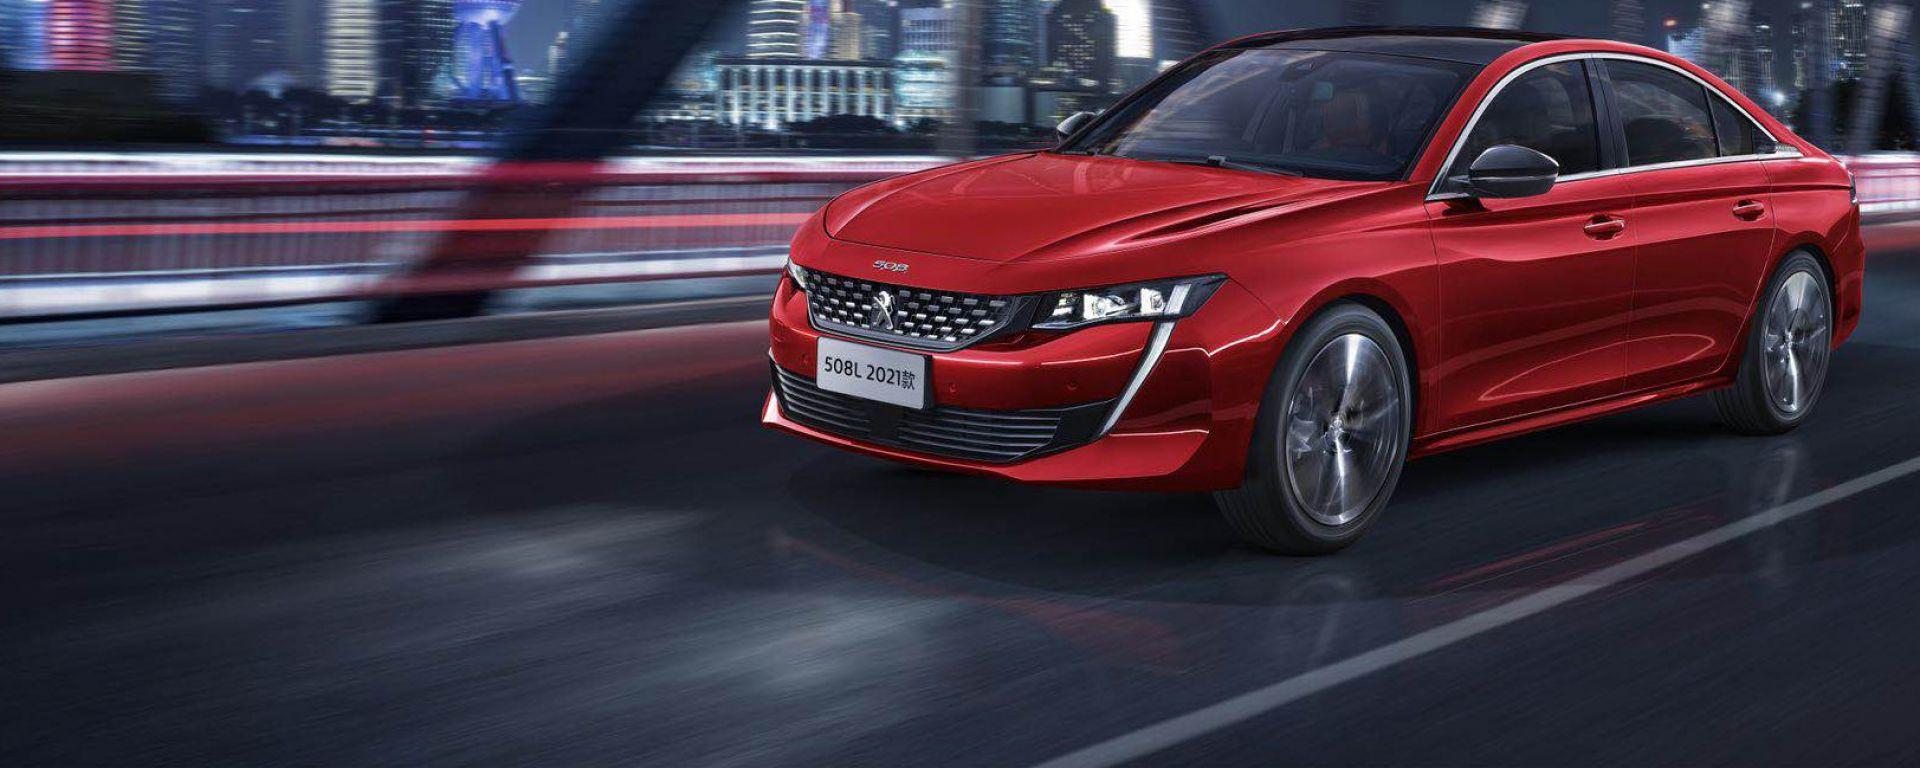 Peugeot 508L 2021